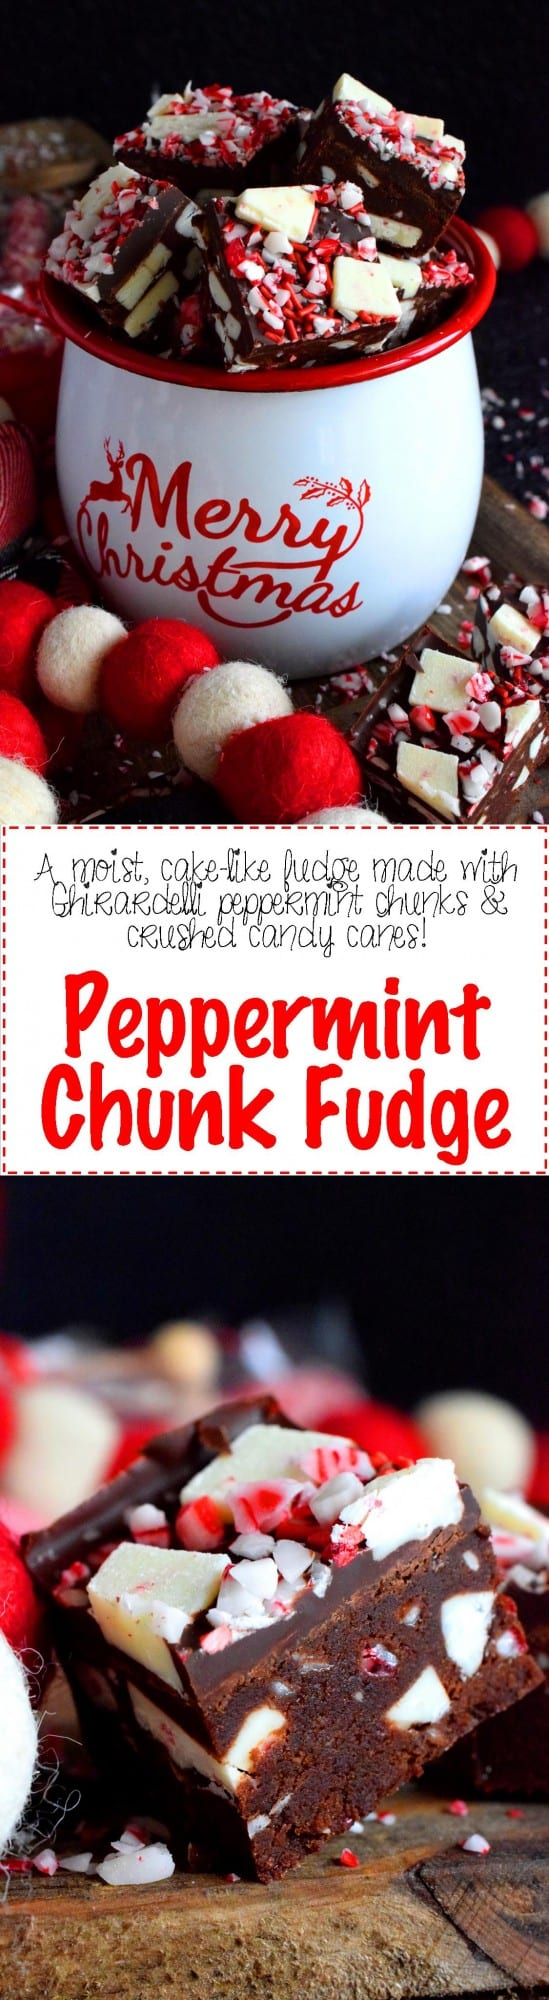 Peppermint Chunk Fudge